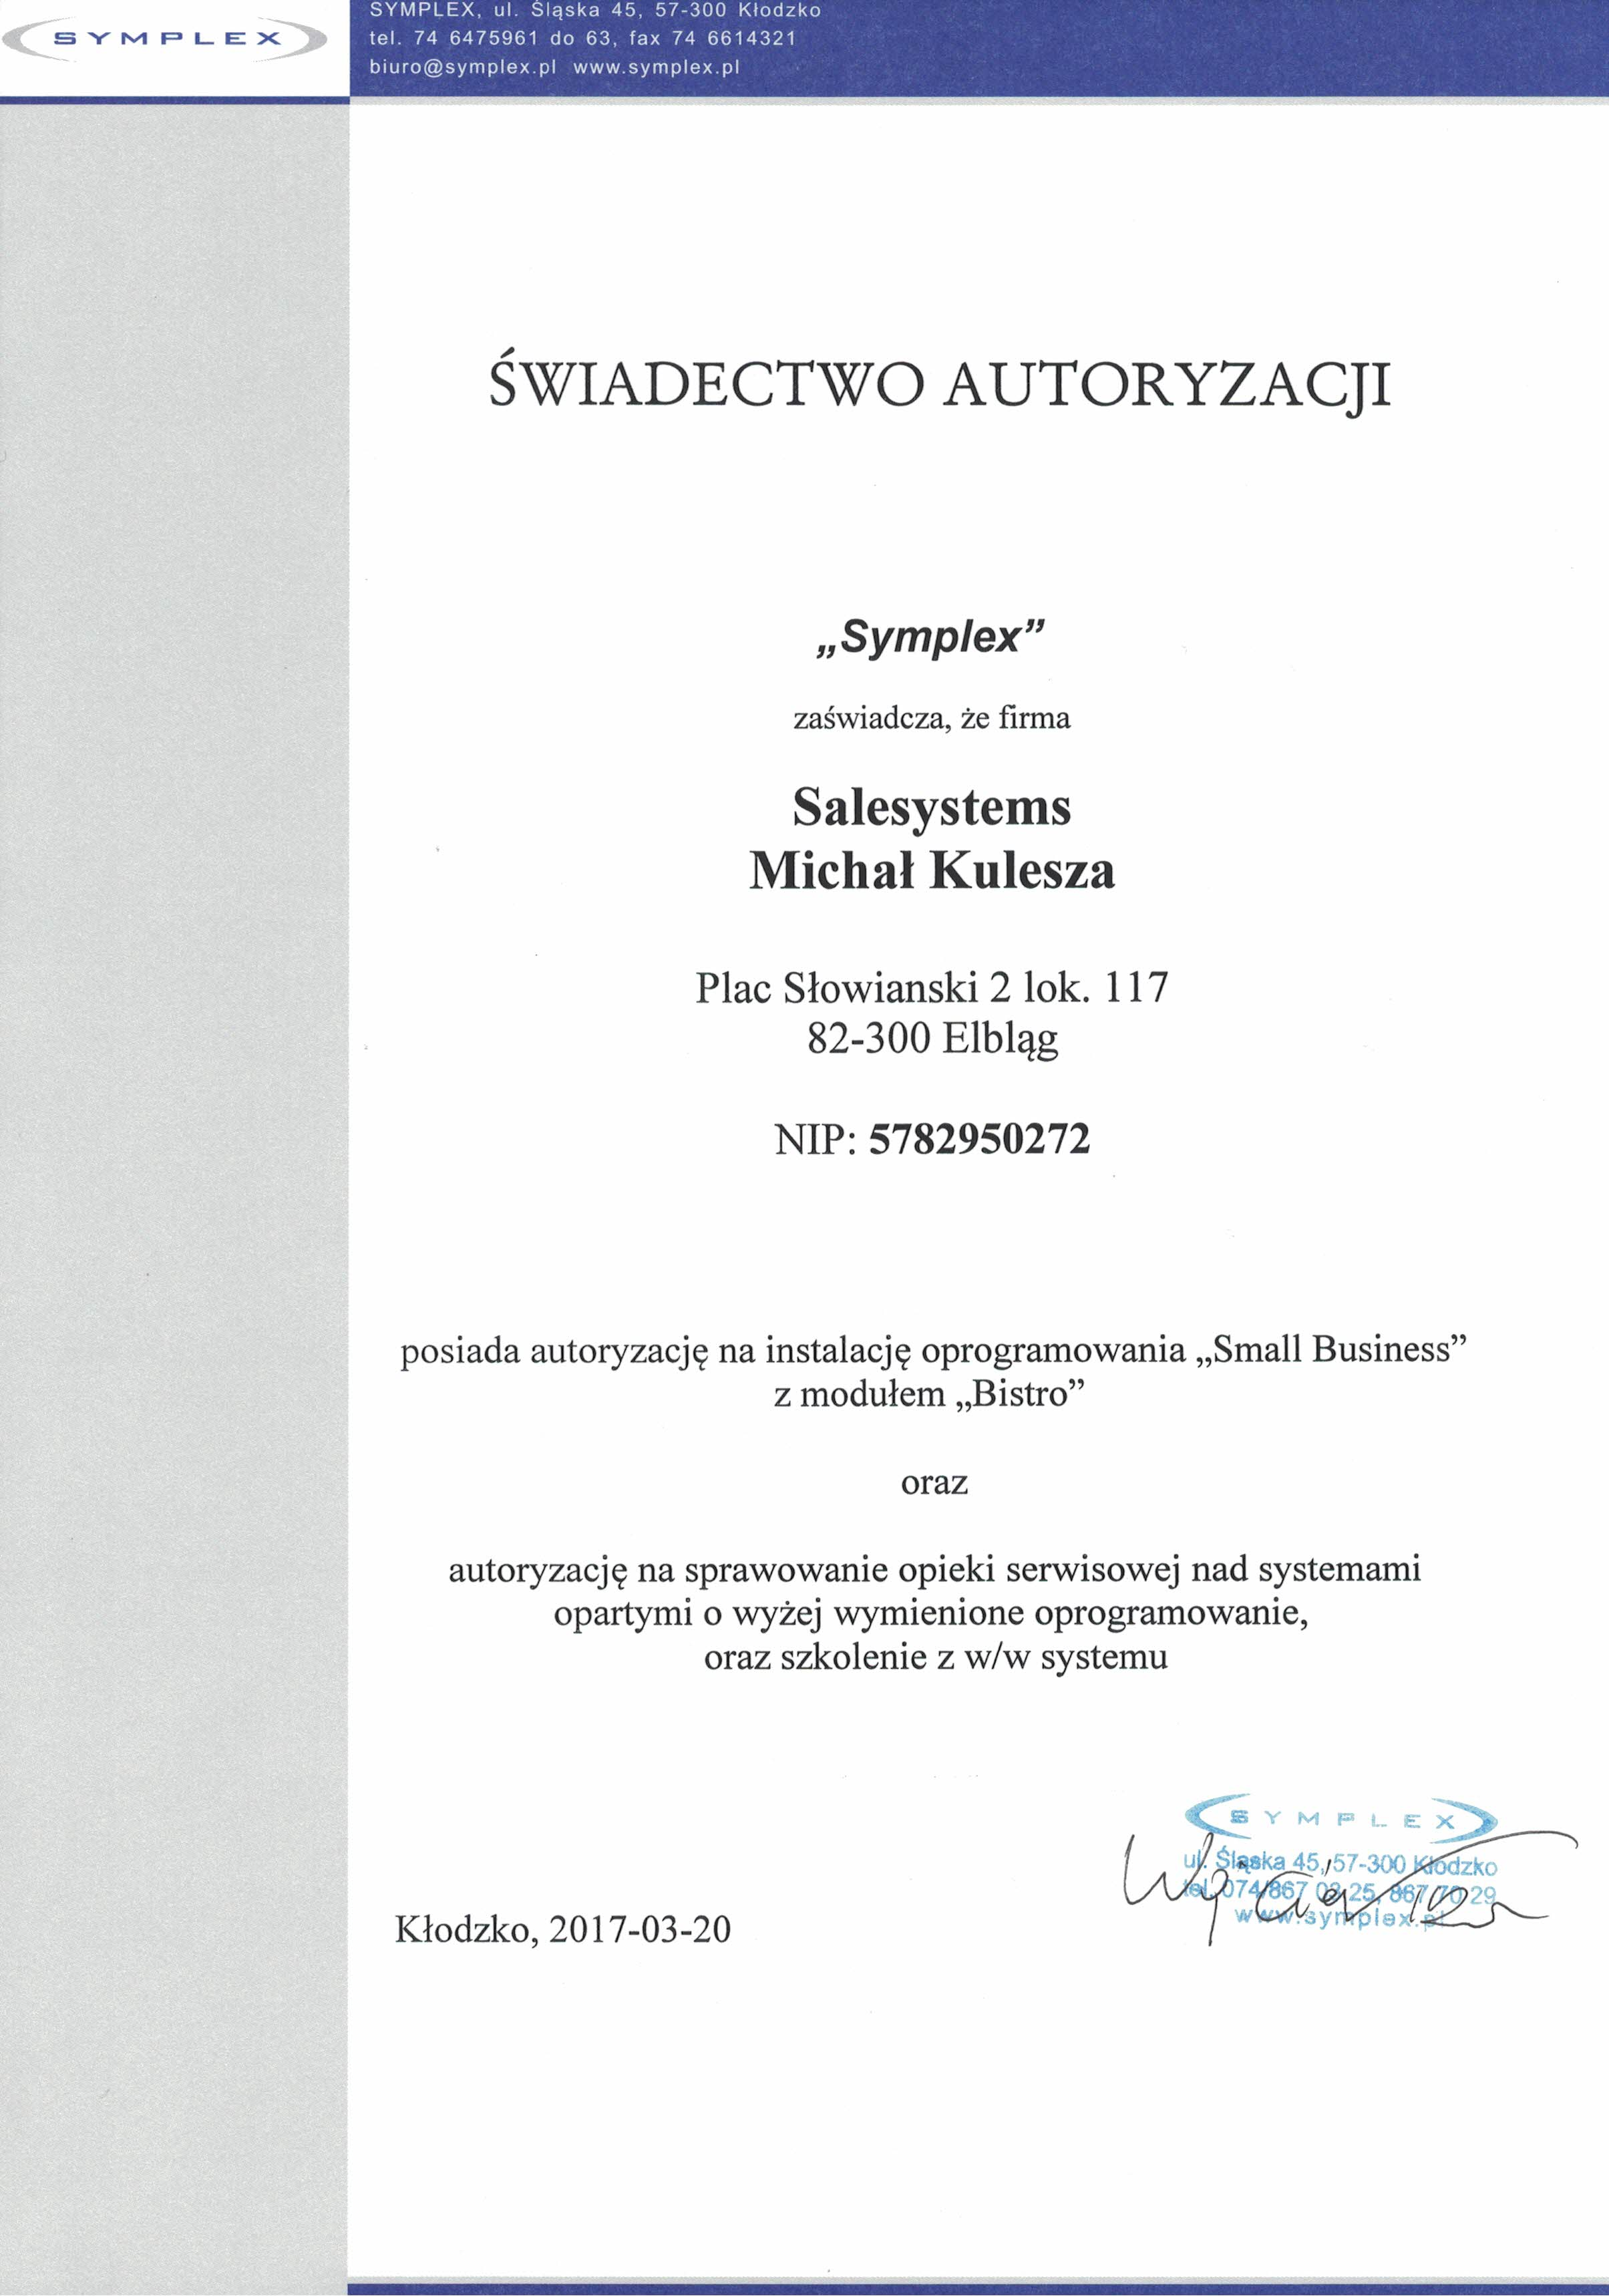 Small Business Symplex Certyfikat